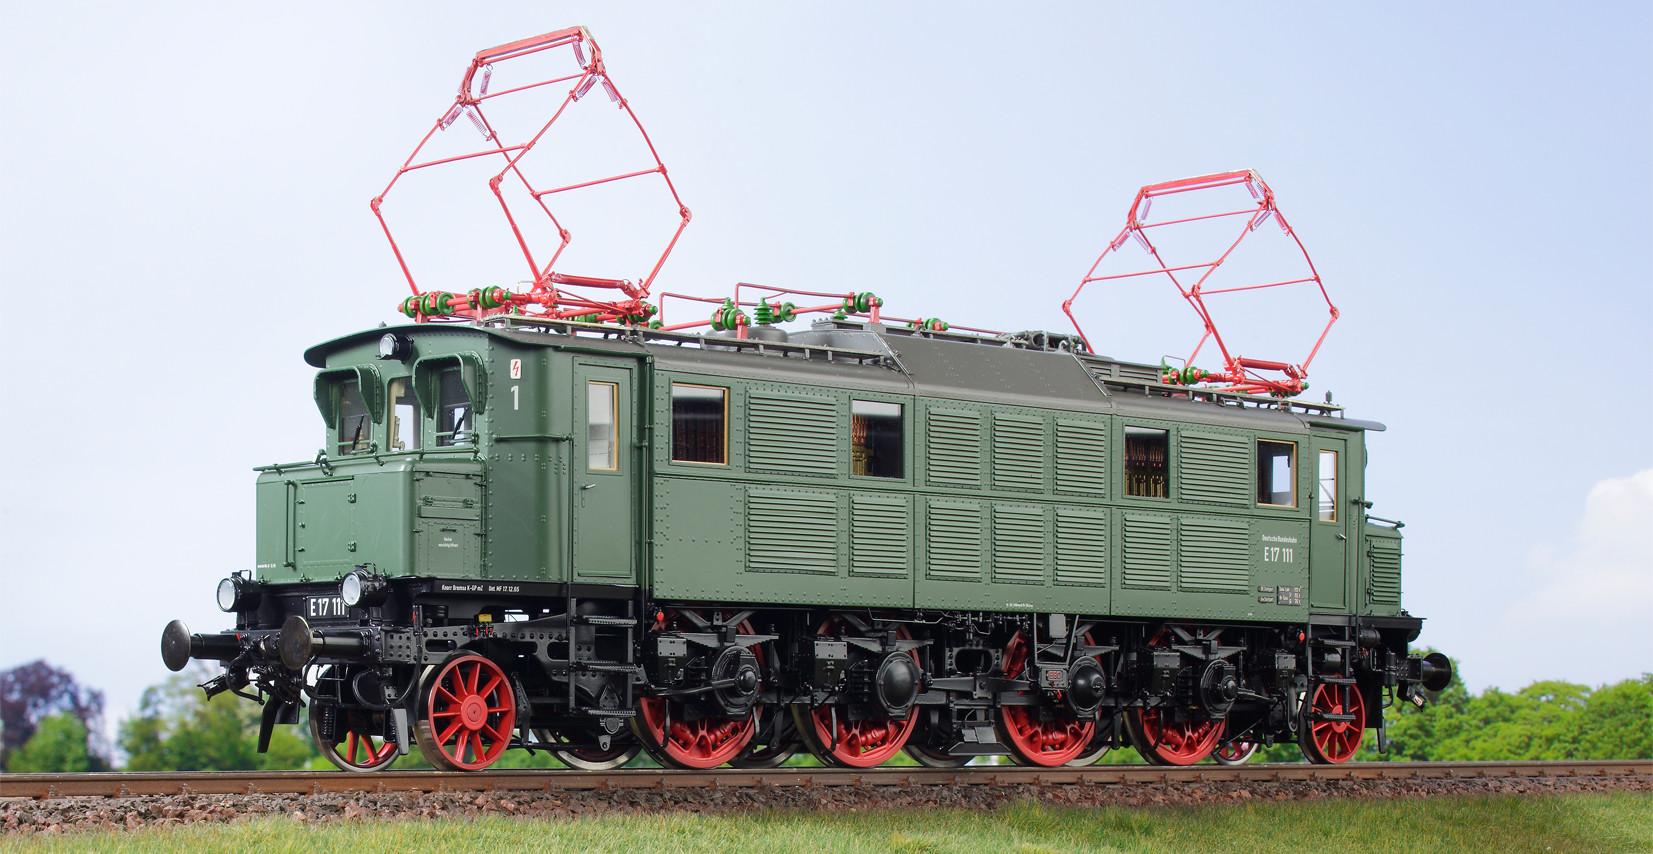 Spur 1 Lokomotive Baureihe E 17 111 Epoche IIIb chromoxydgrün